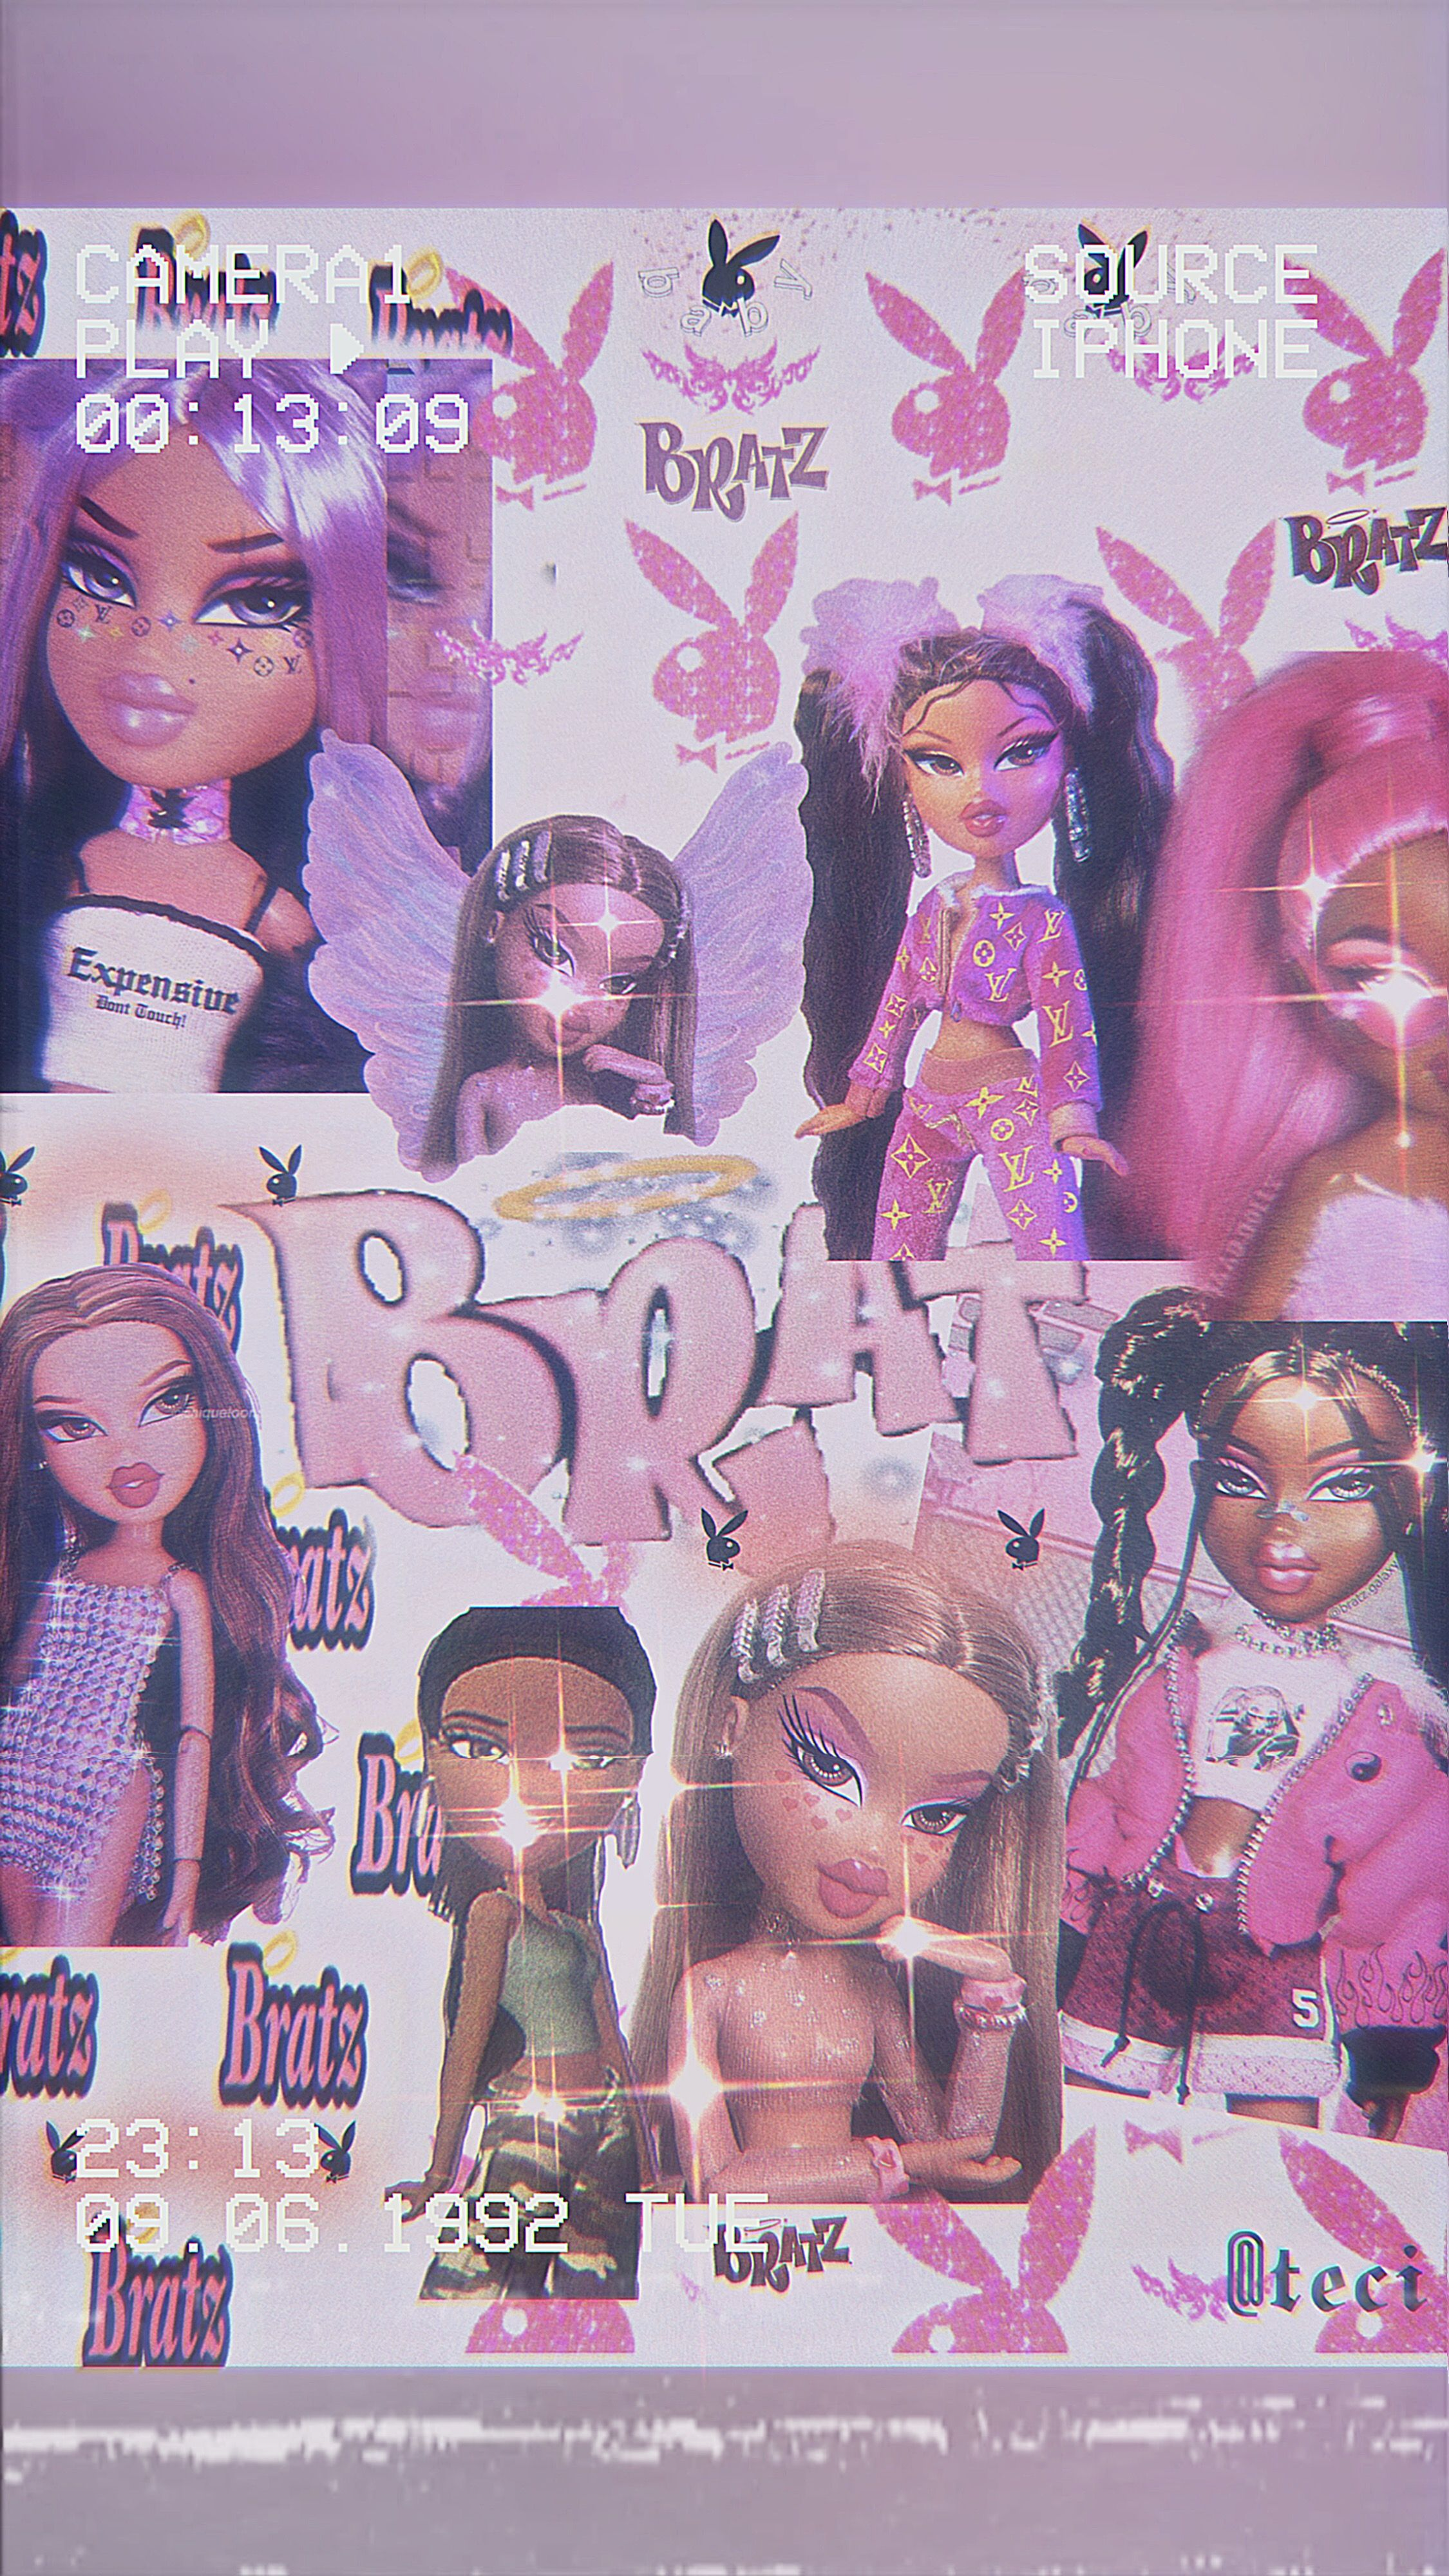 Bratz 90s Wallpaper Cartoon Wallpaper Iphone Pink Wallpaper Iphone Pretty Wallpaper Iphone